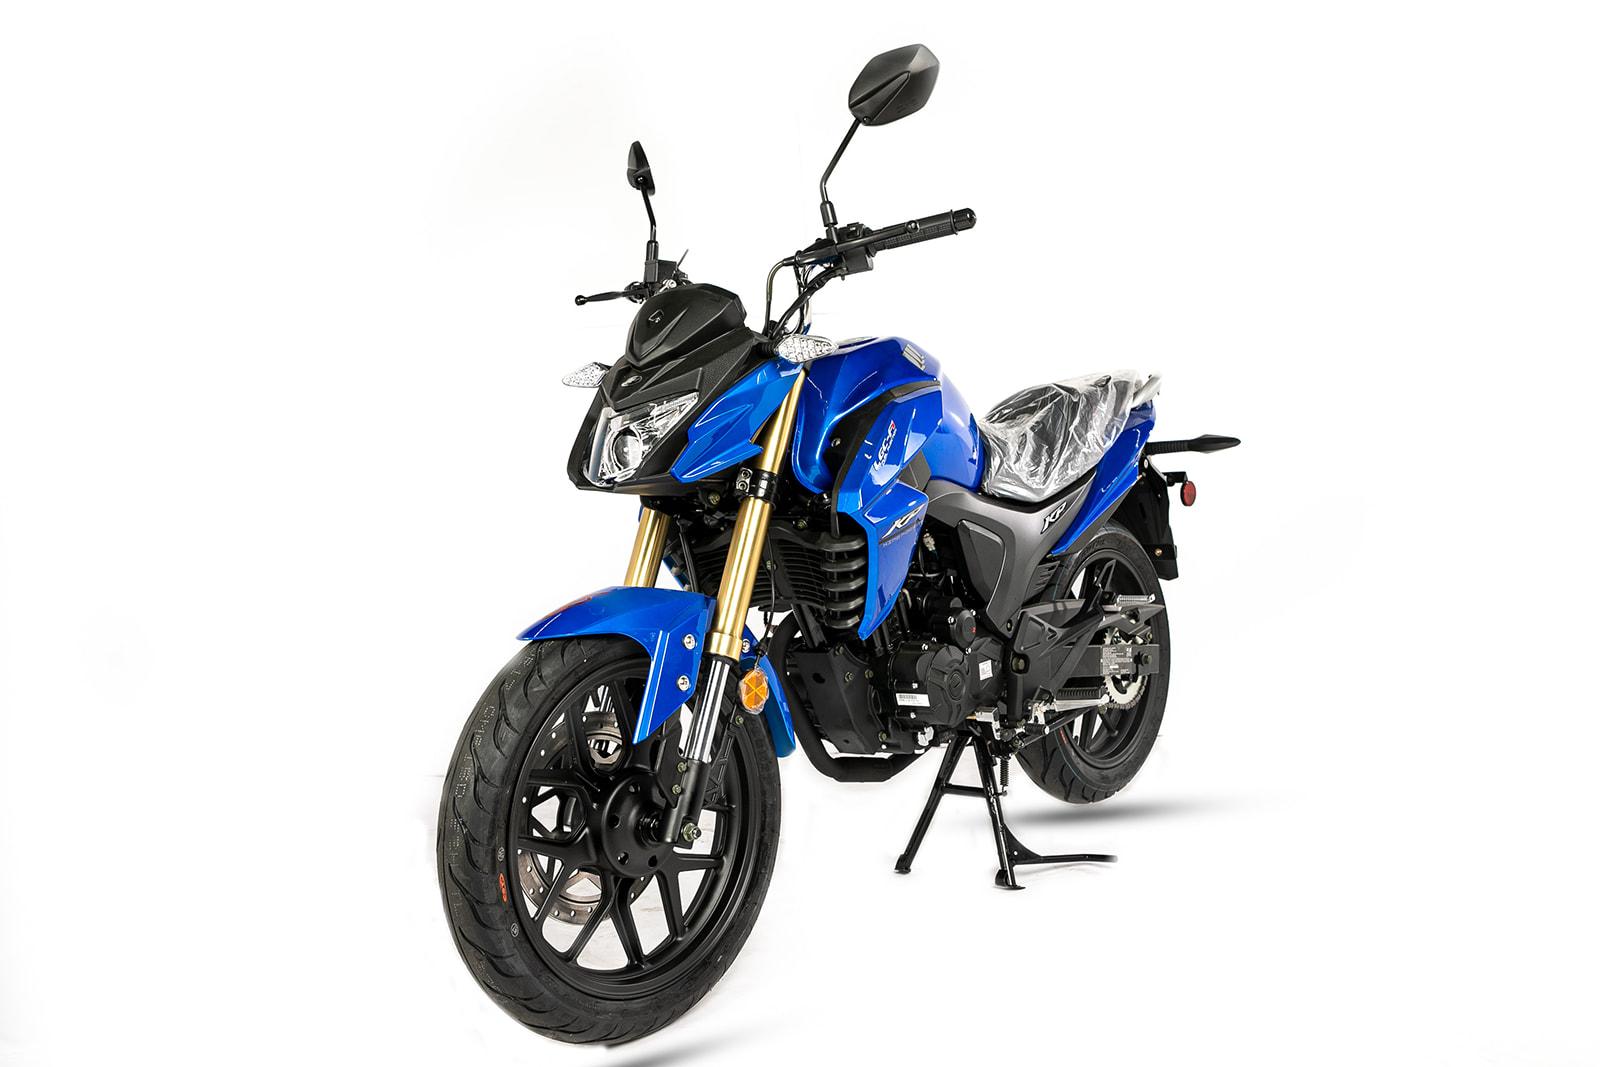 LIFAN KP 200  MOTORCYCLE